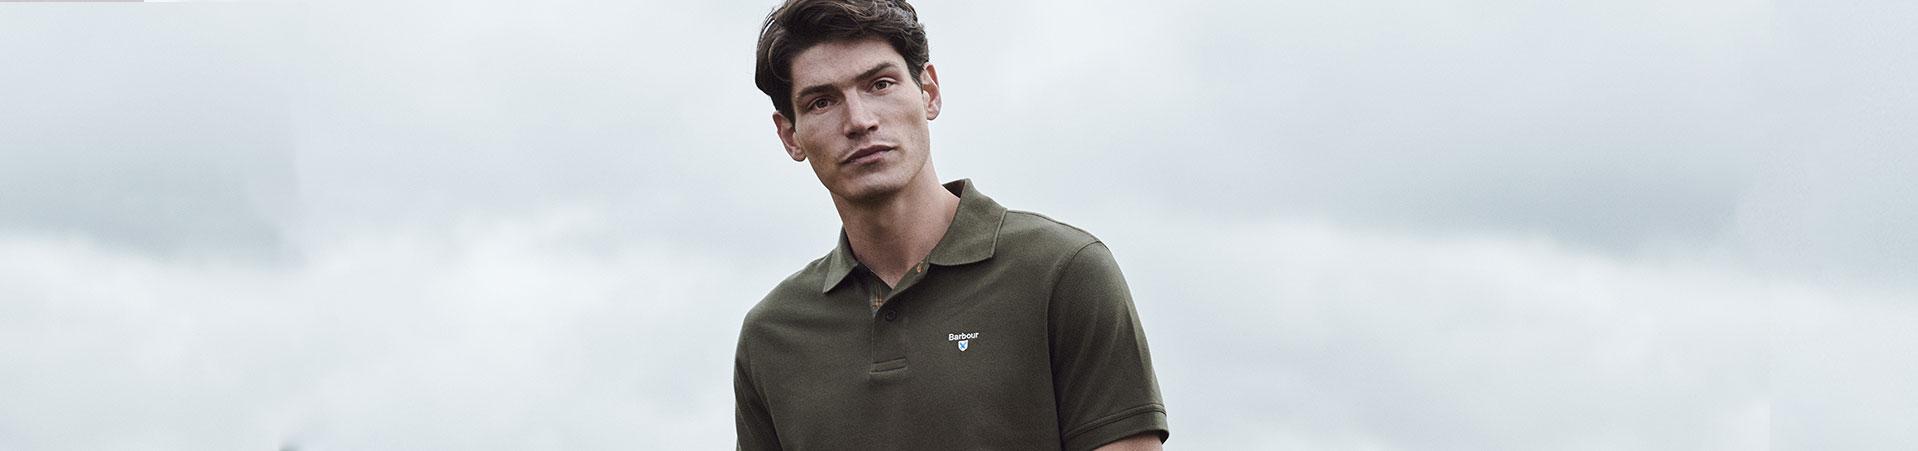 Barbour Men's Sports T-Shirt Blog Header